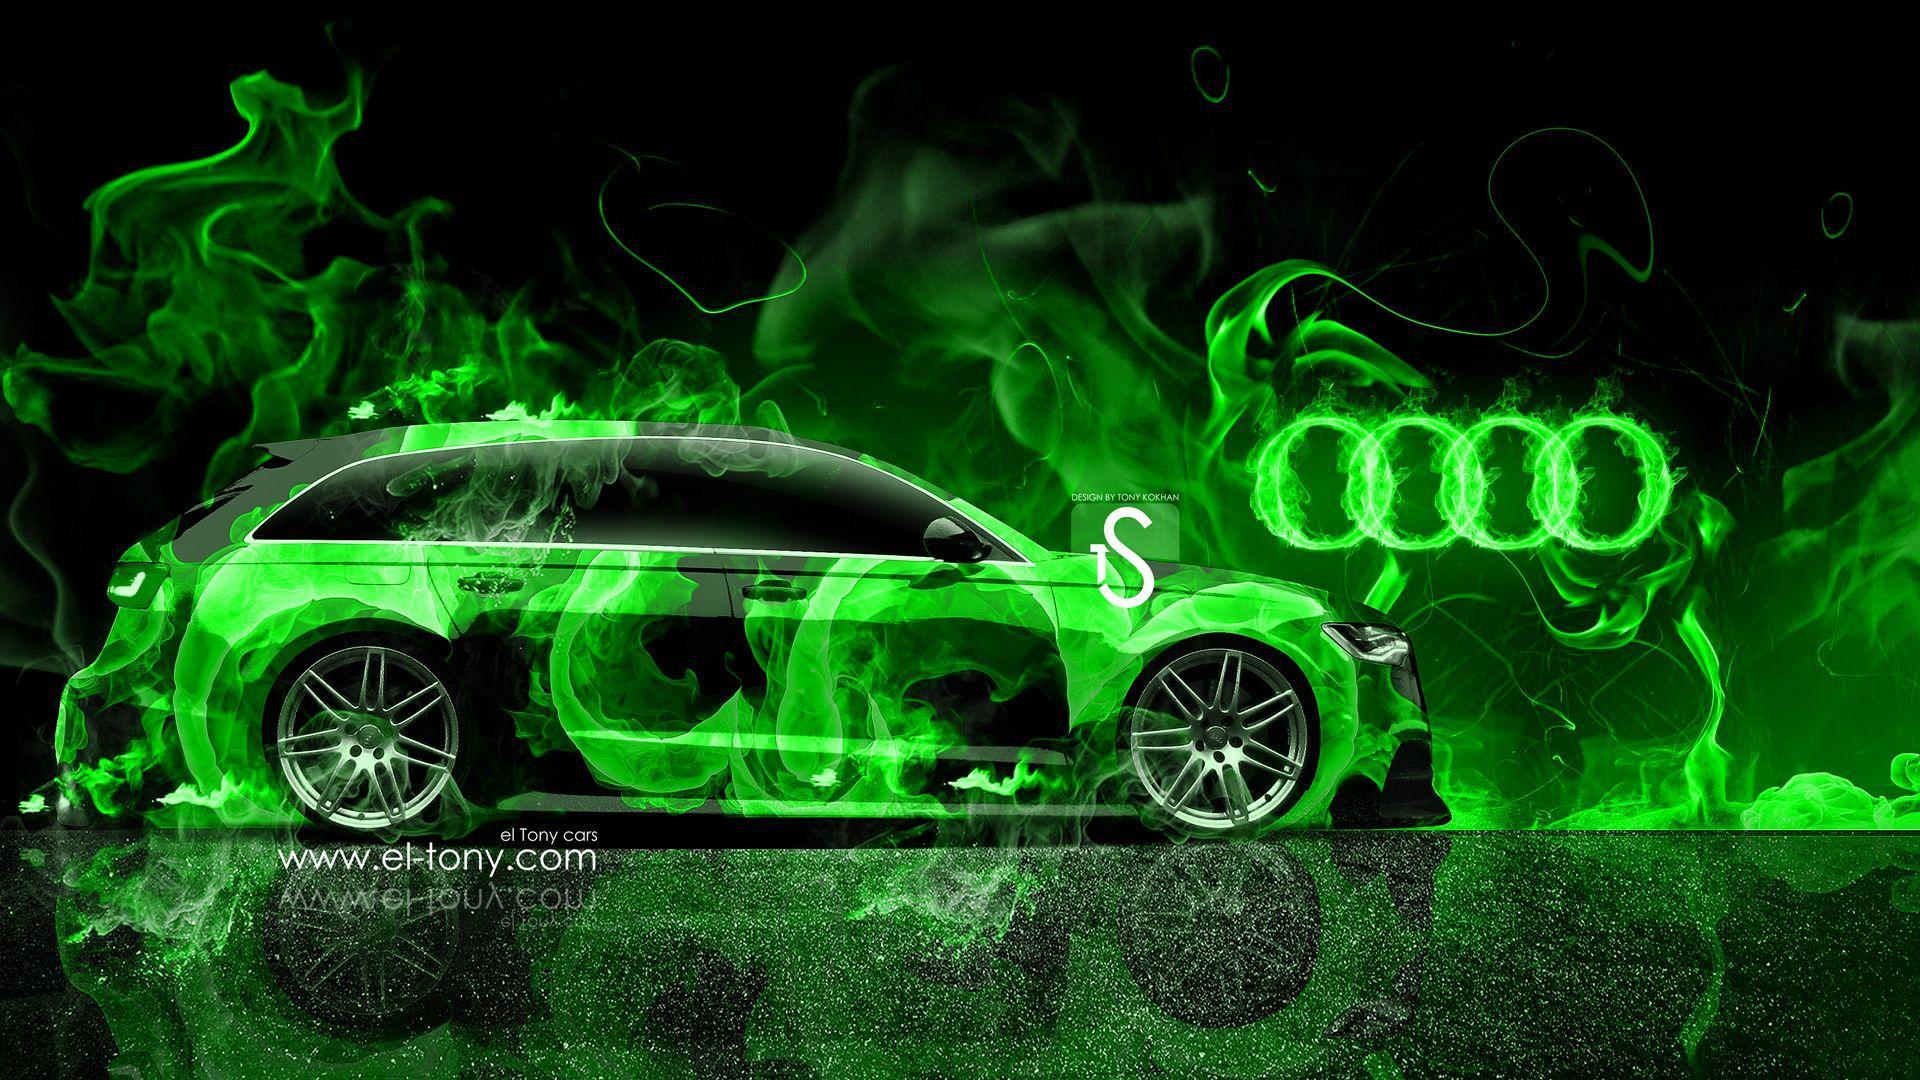 Neon Green Car Wallpapers Top Free Neon Green Car